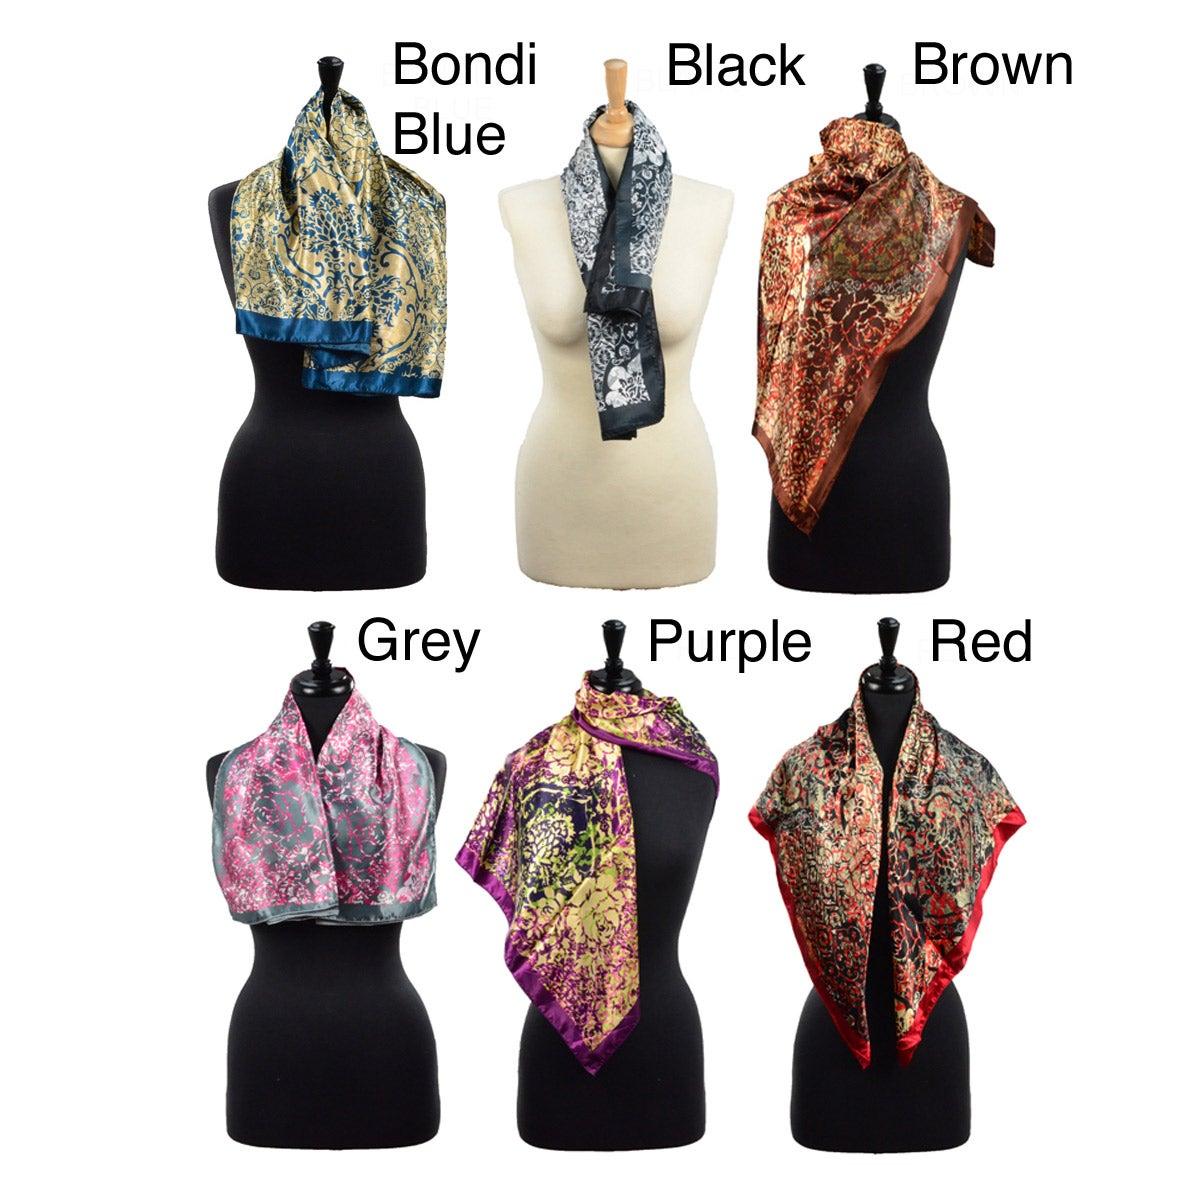 Reversible LA77 Women's Floral-Print Scarf